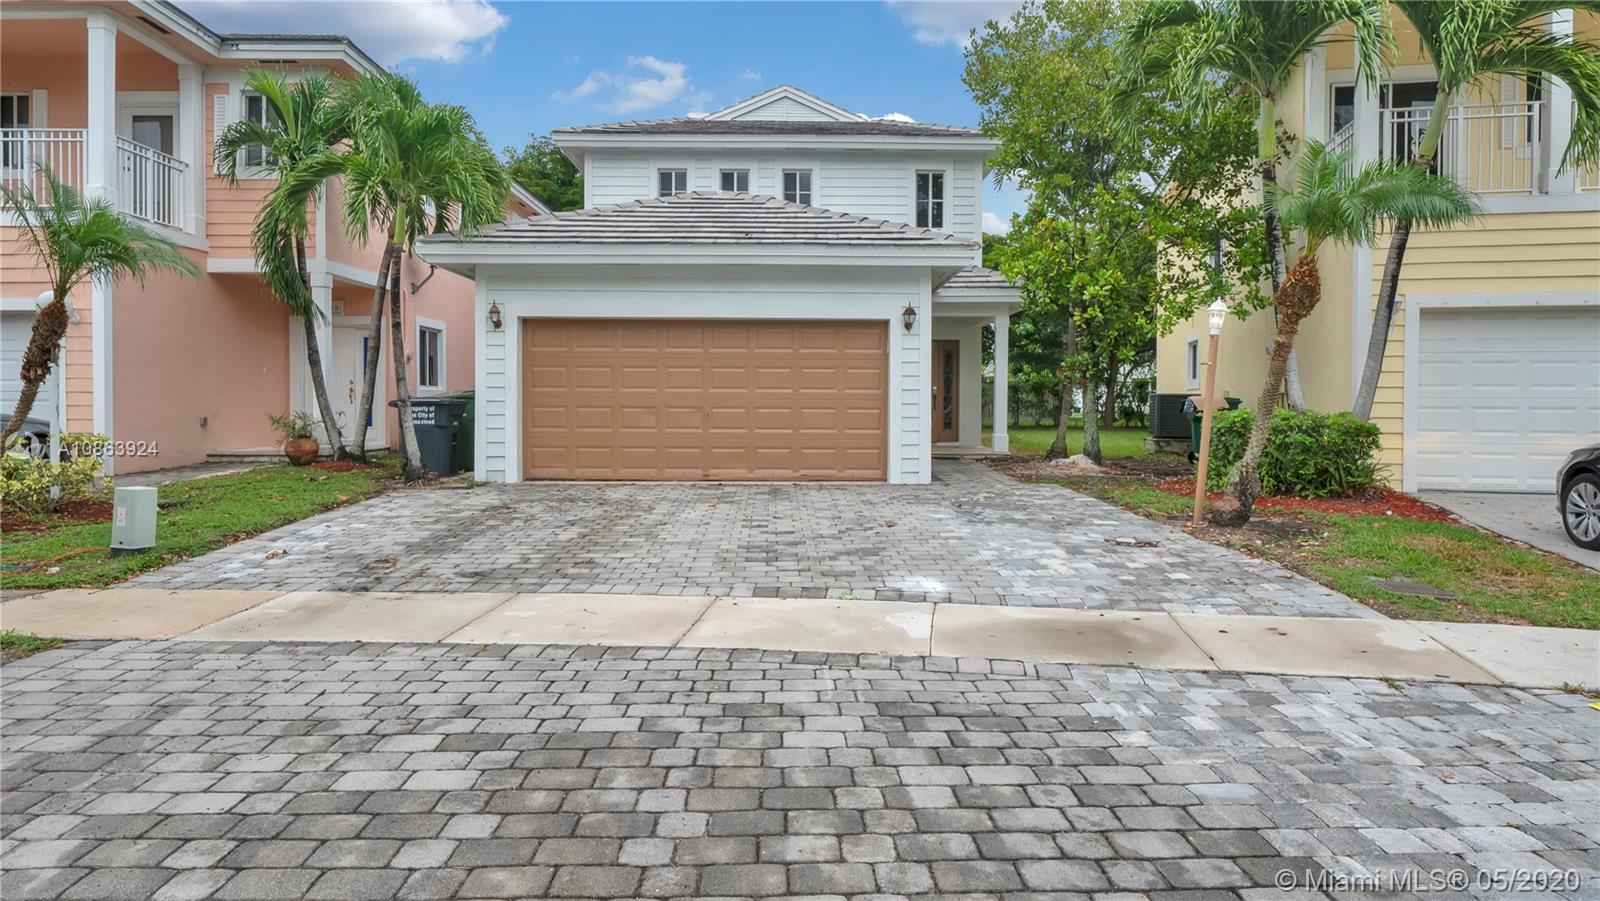 363 NE 35th Ter, Homestead, FL 33033 - Homestead, FL real estate listing